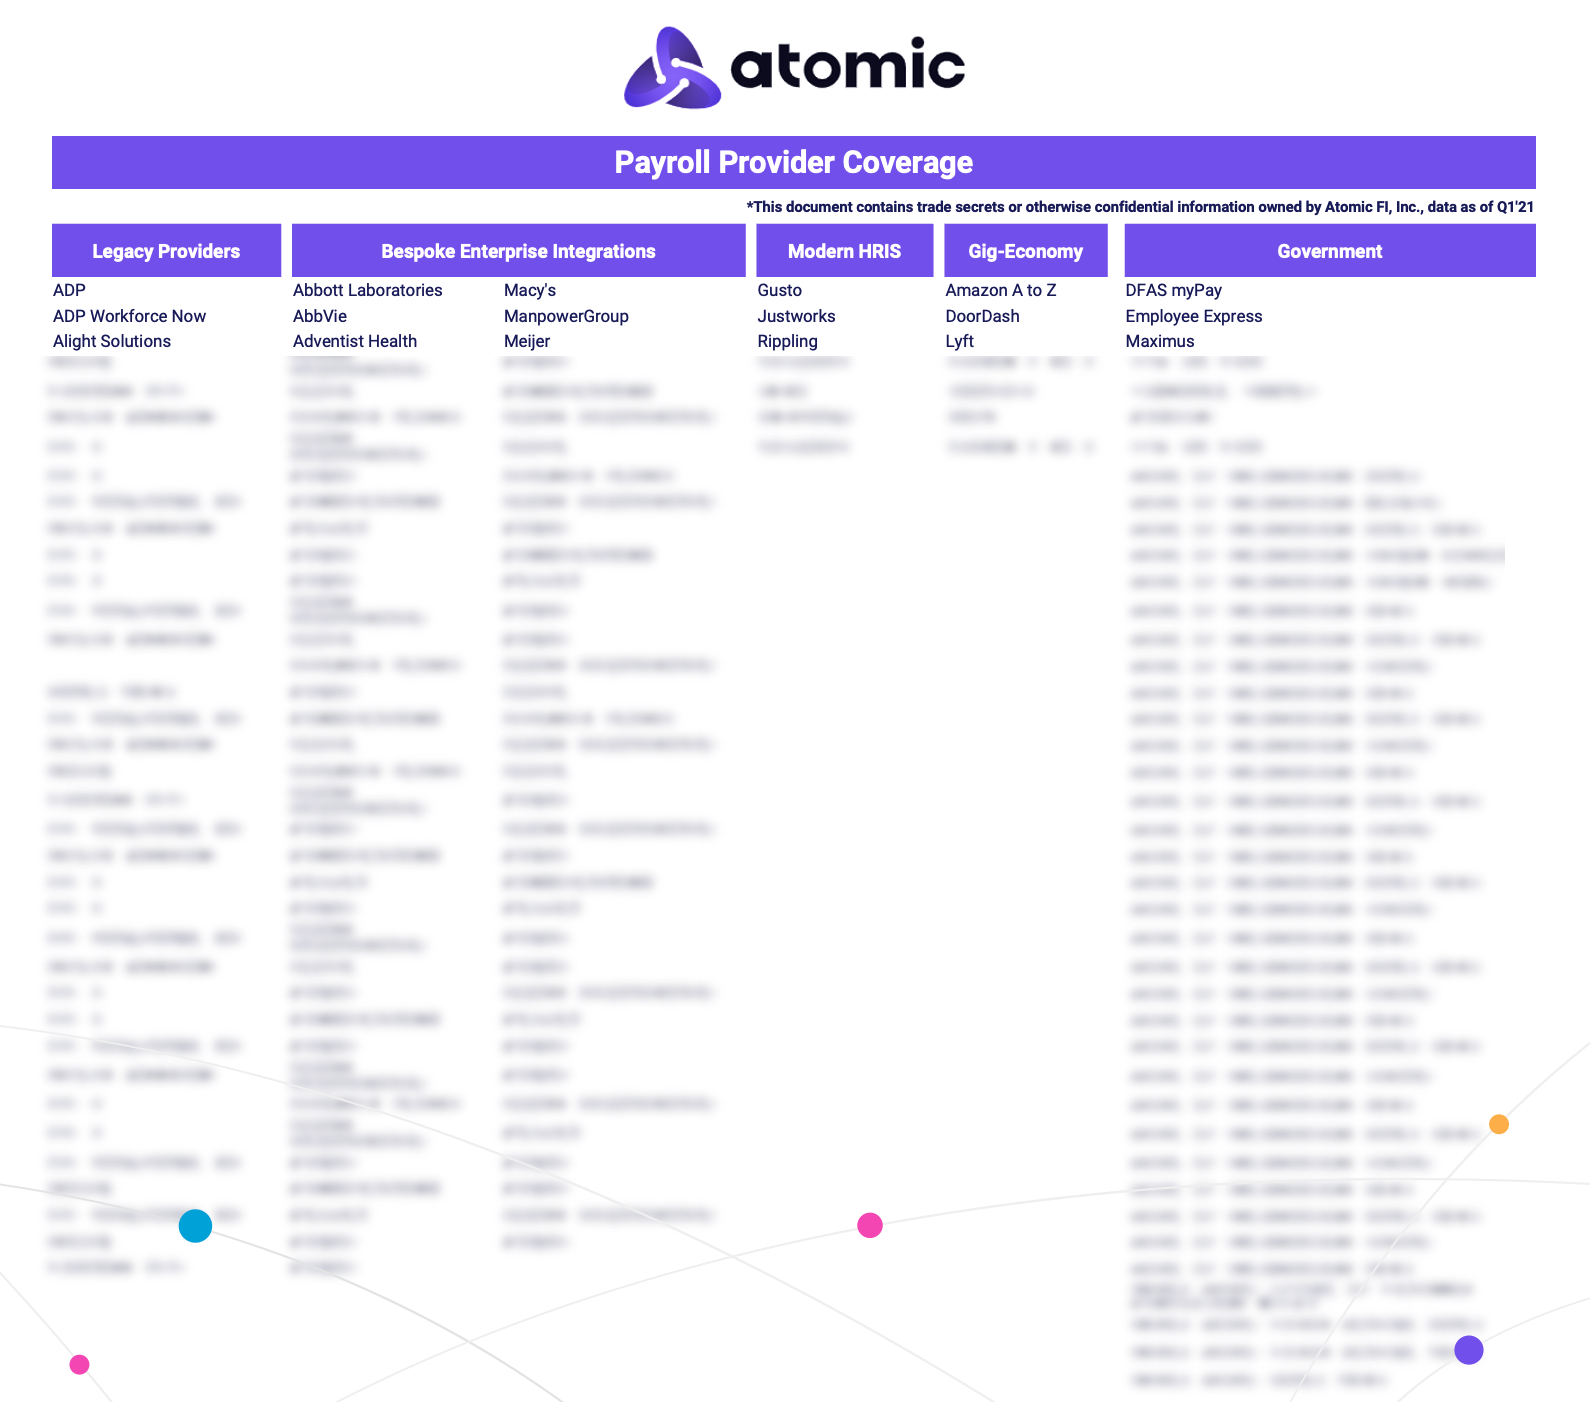 Atomic Payroll API Payroll Provider Coverage Benchmark Q121